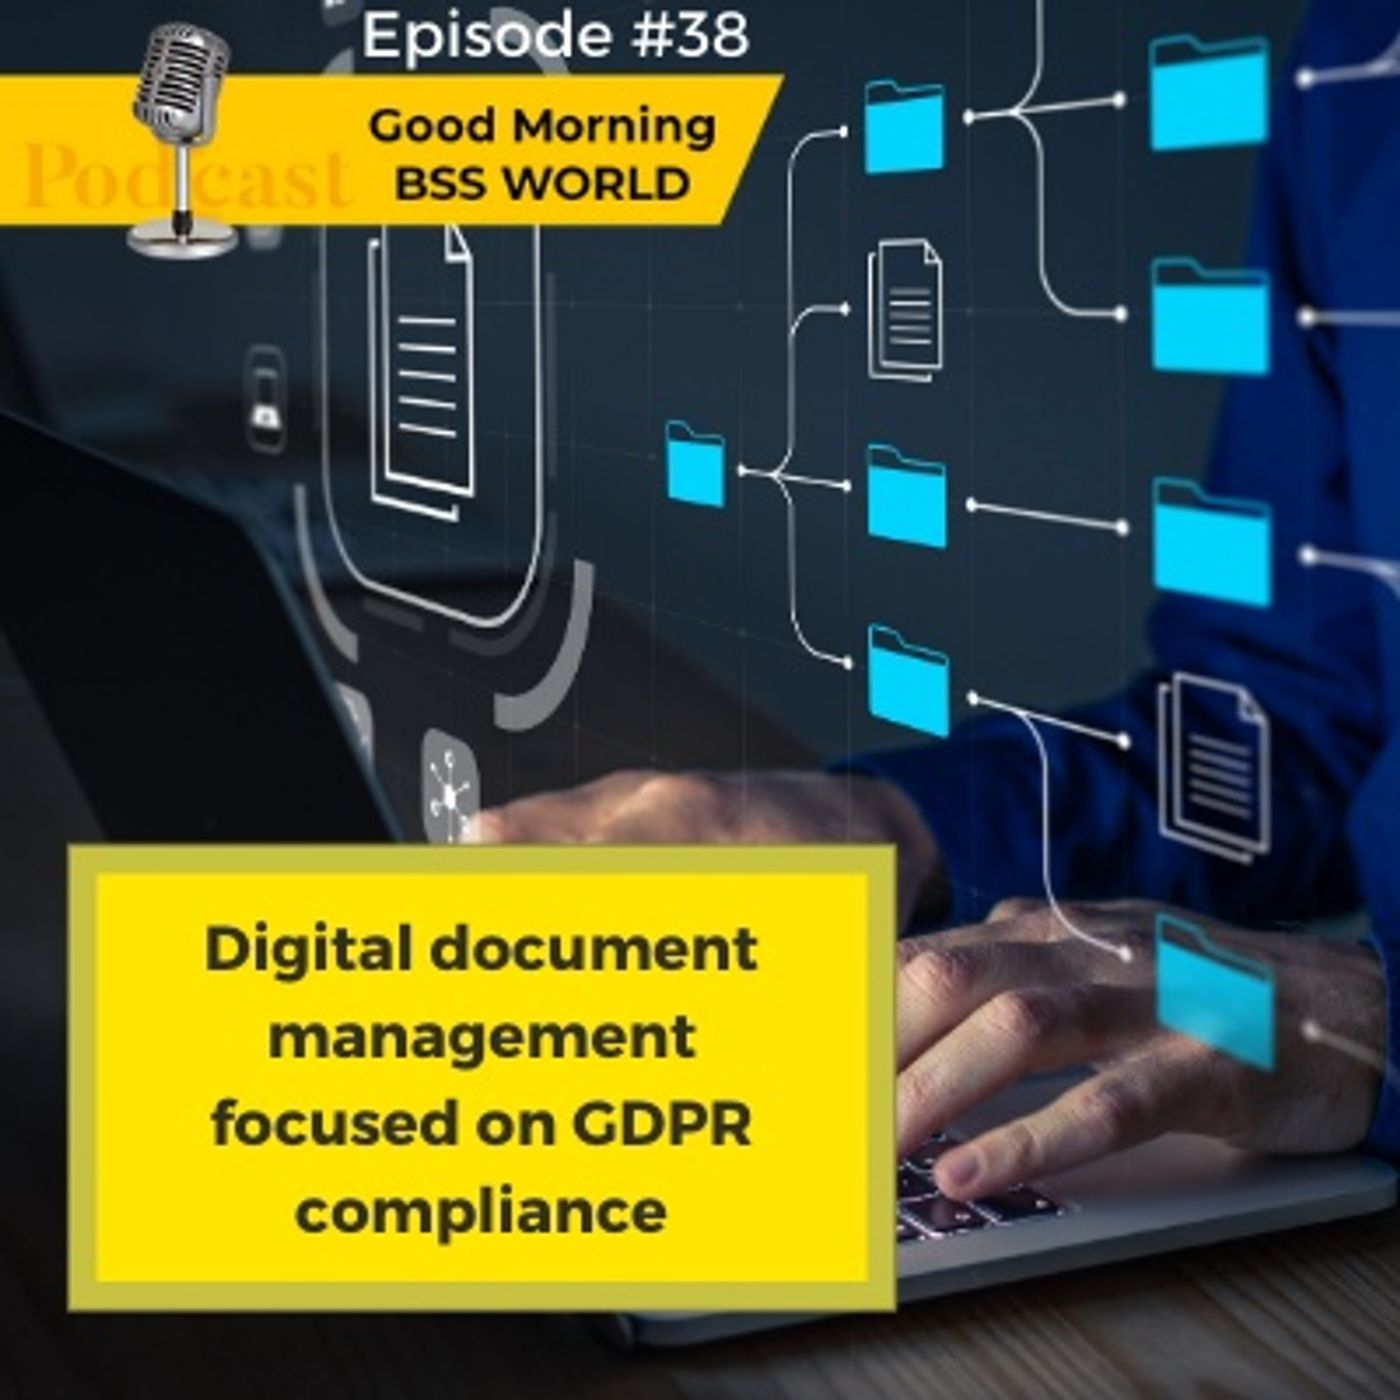 #39 Digital document management focused on GDPR compliance